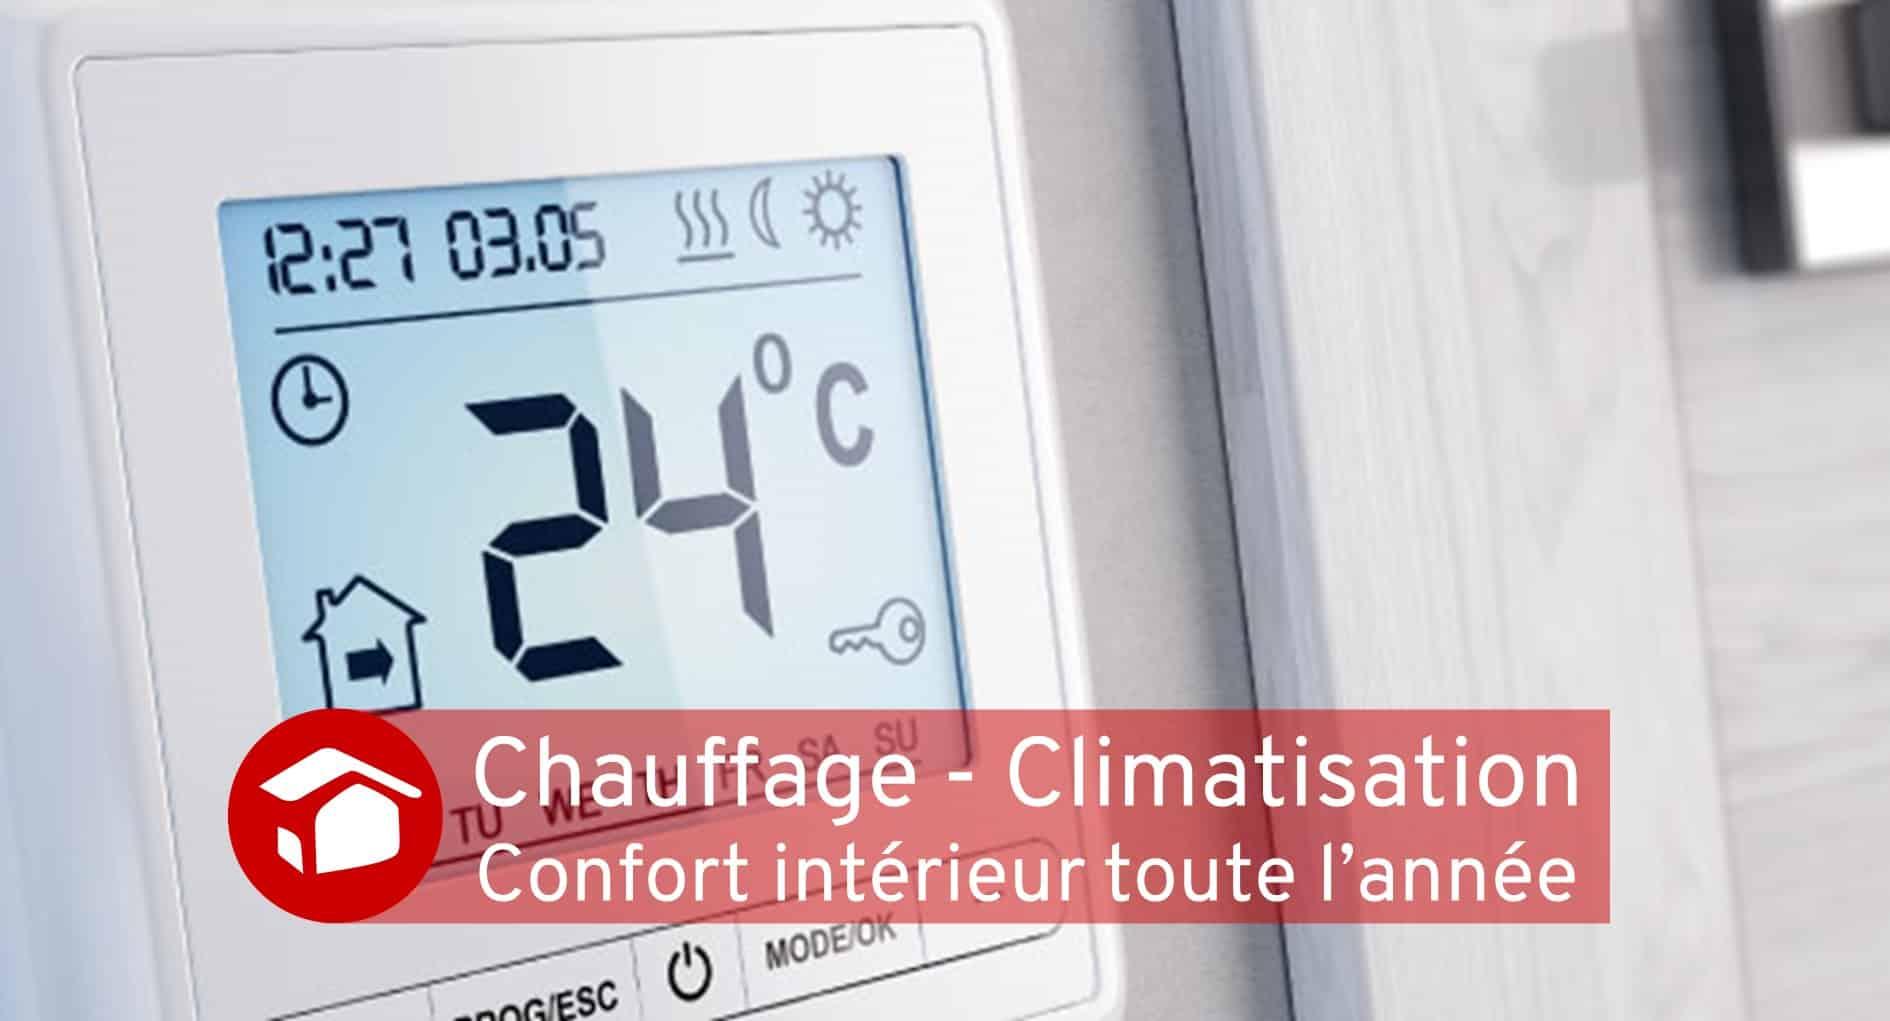 Chauffage - Climatisation travaux